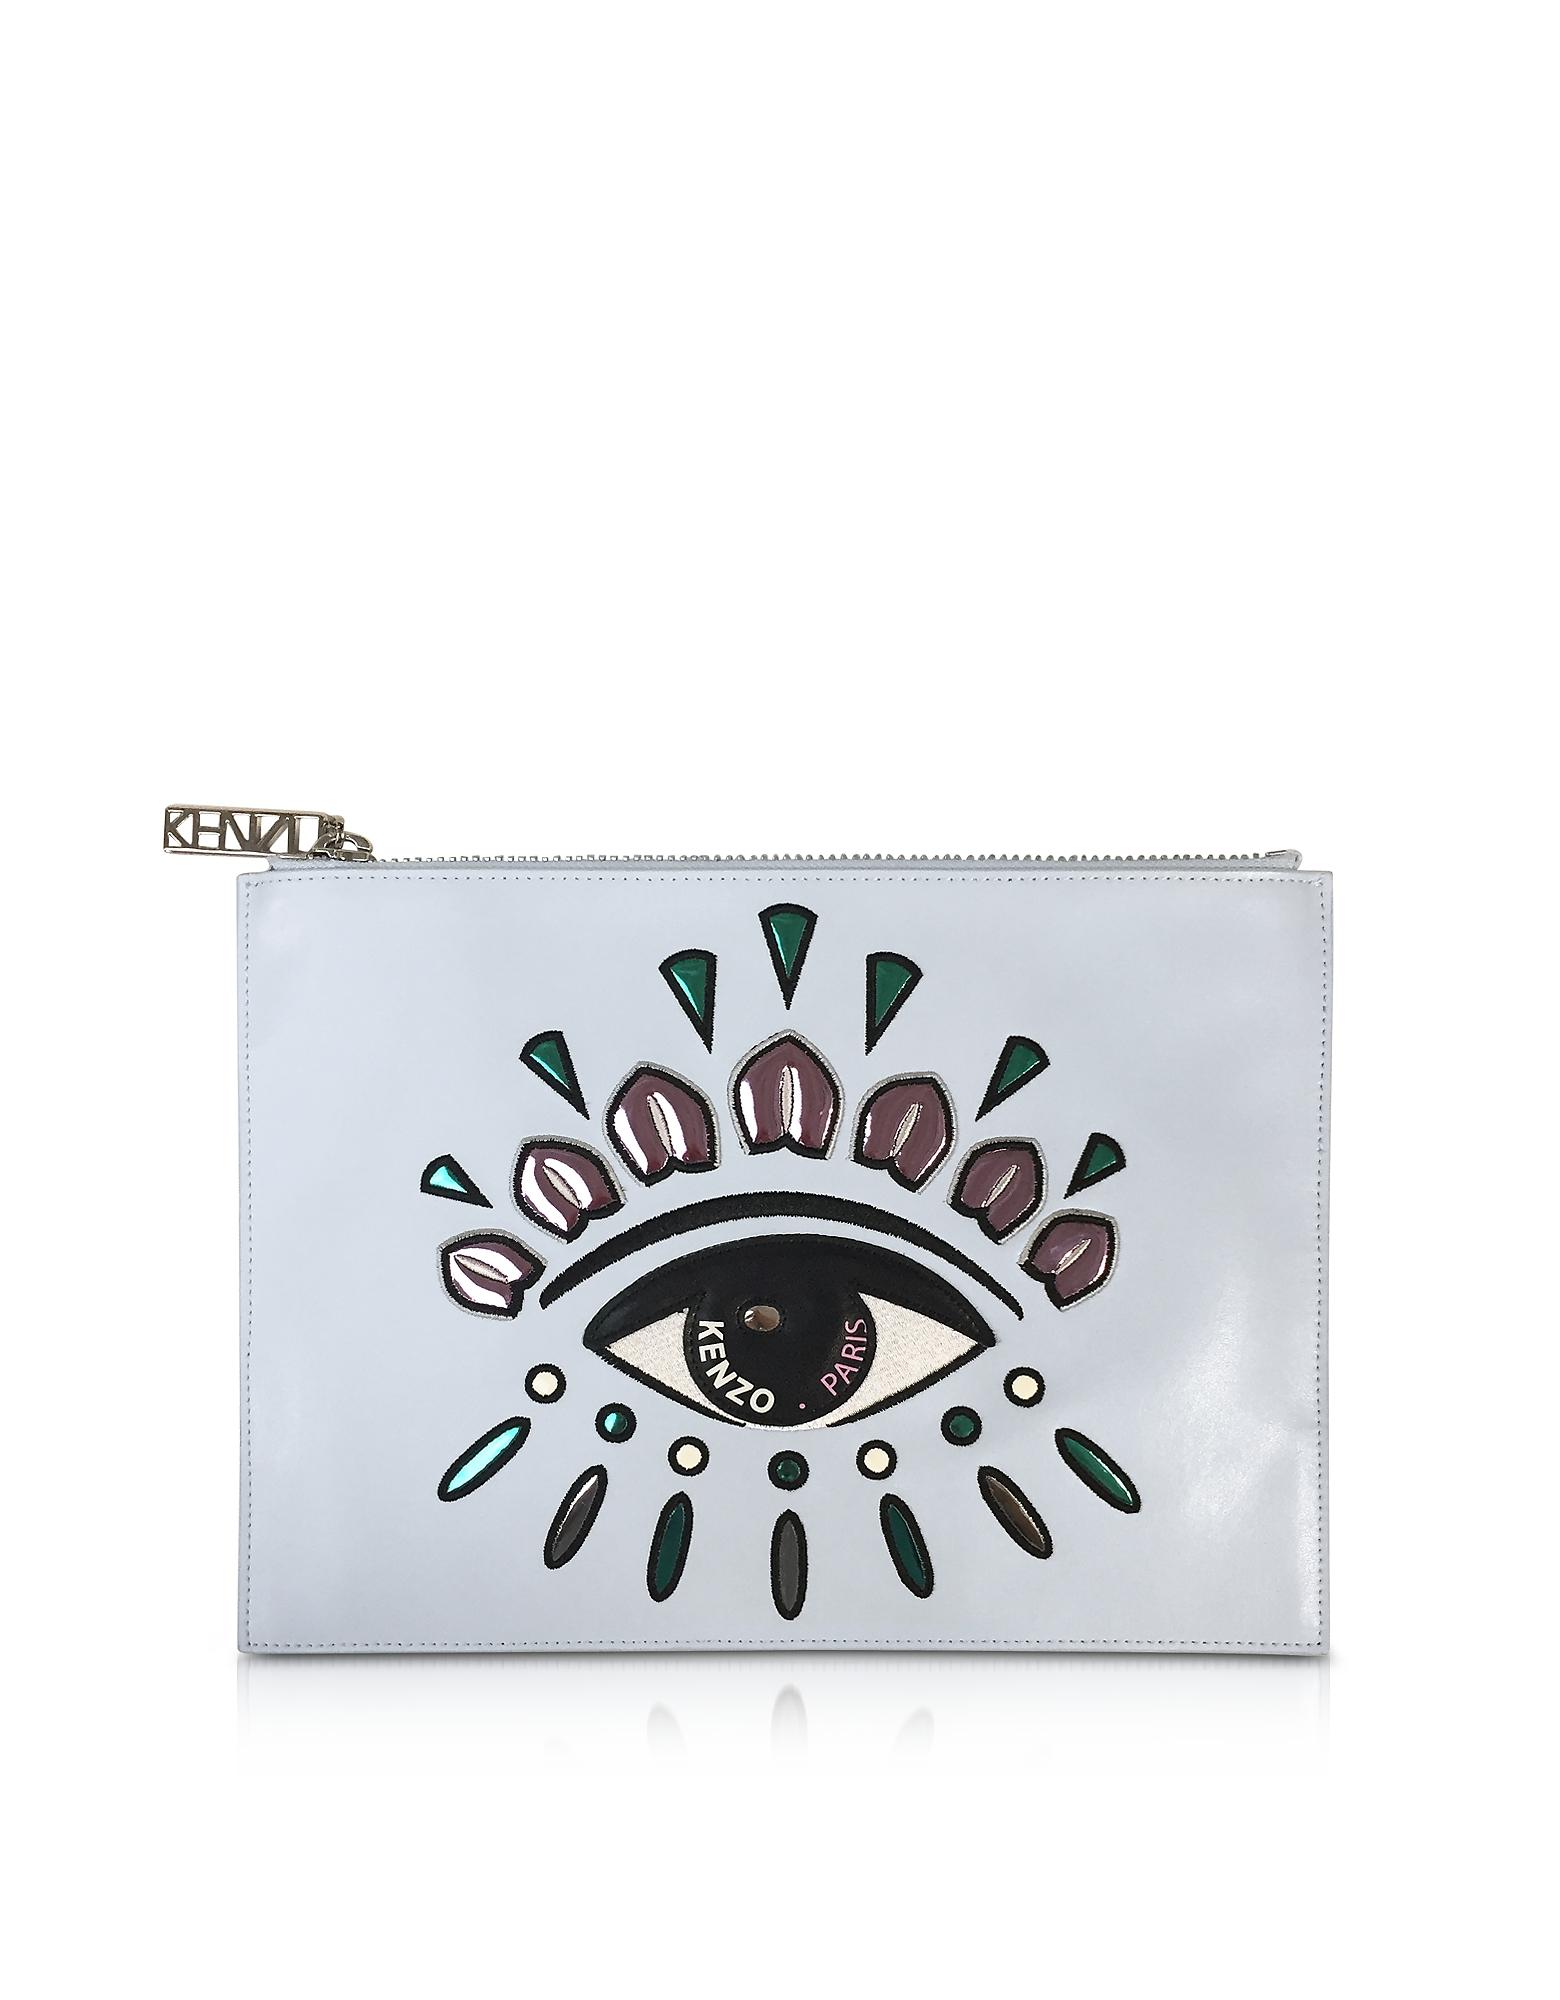 Kenzo Handbags, A5 Sky Blue Leather Eye Pochette